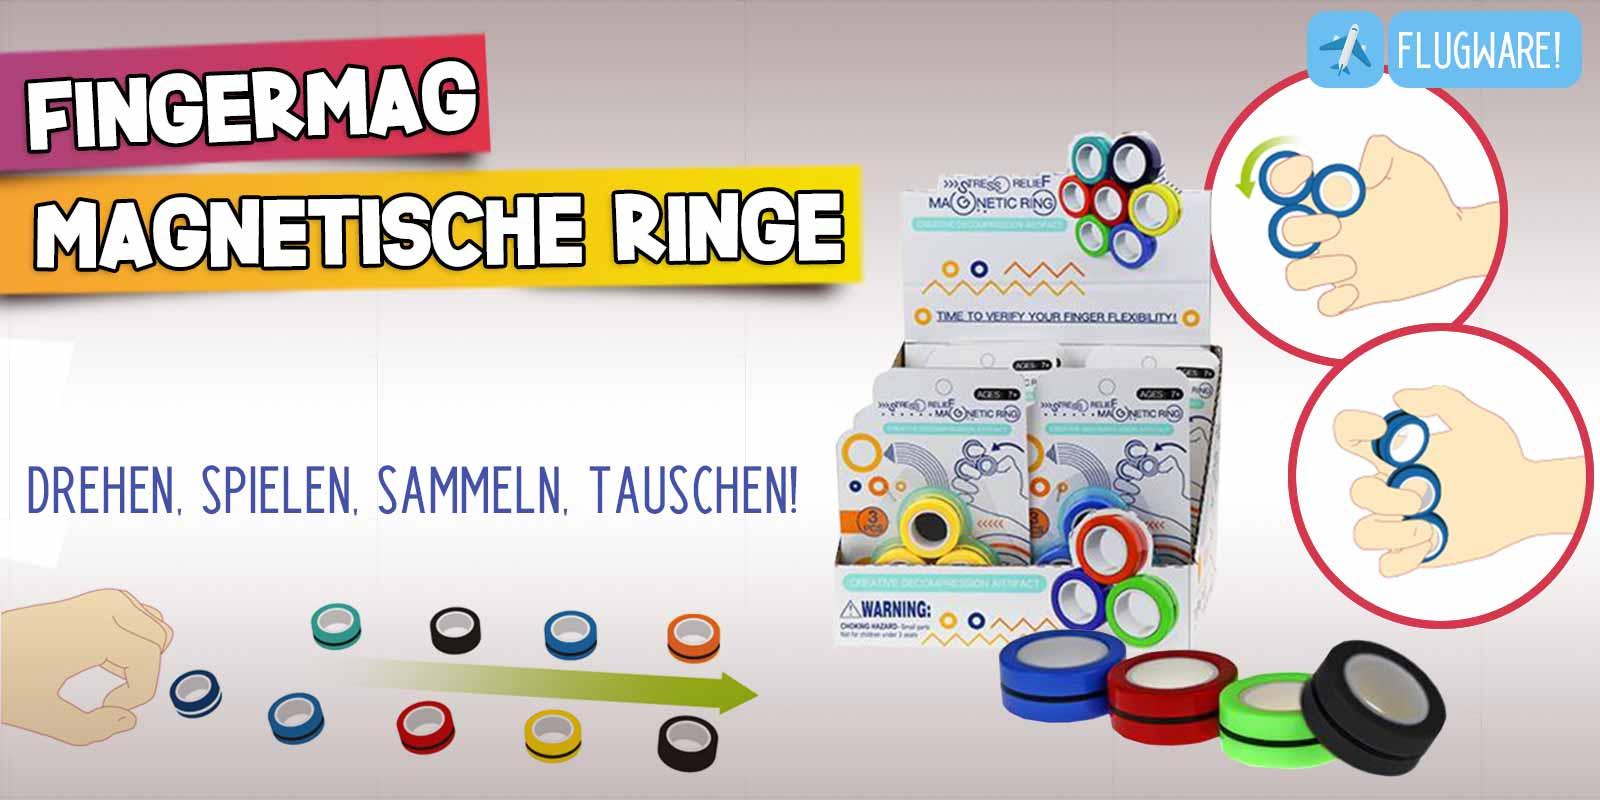 FingerMag Magnetische Fingerringe